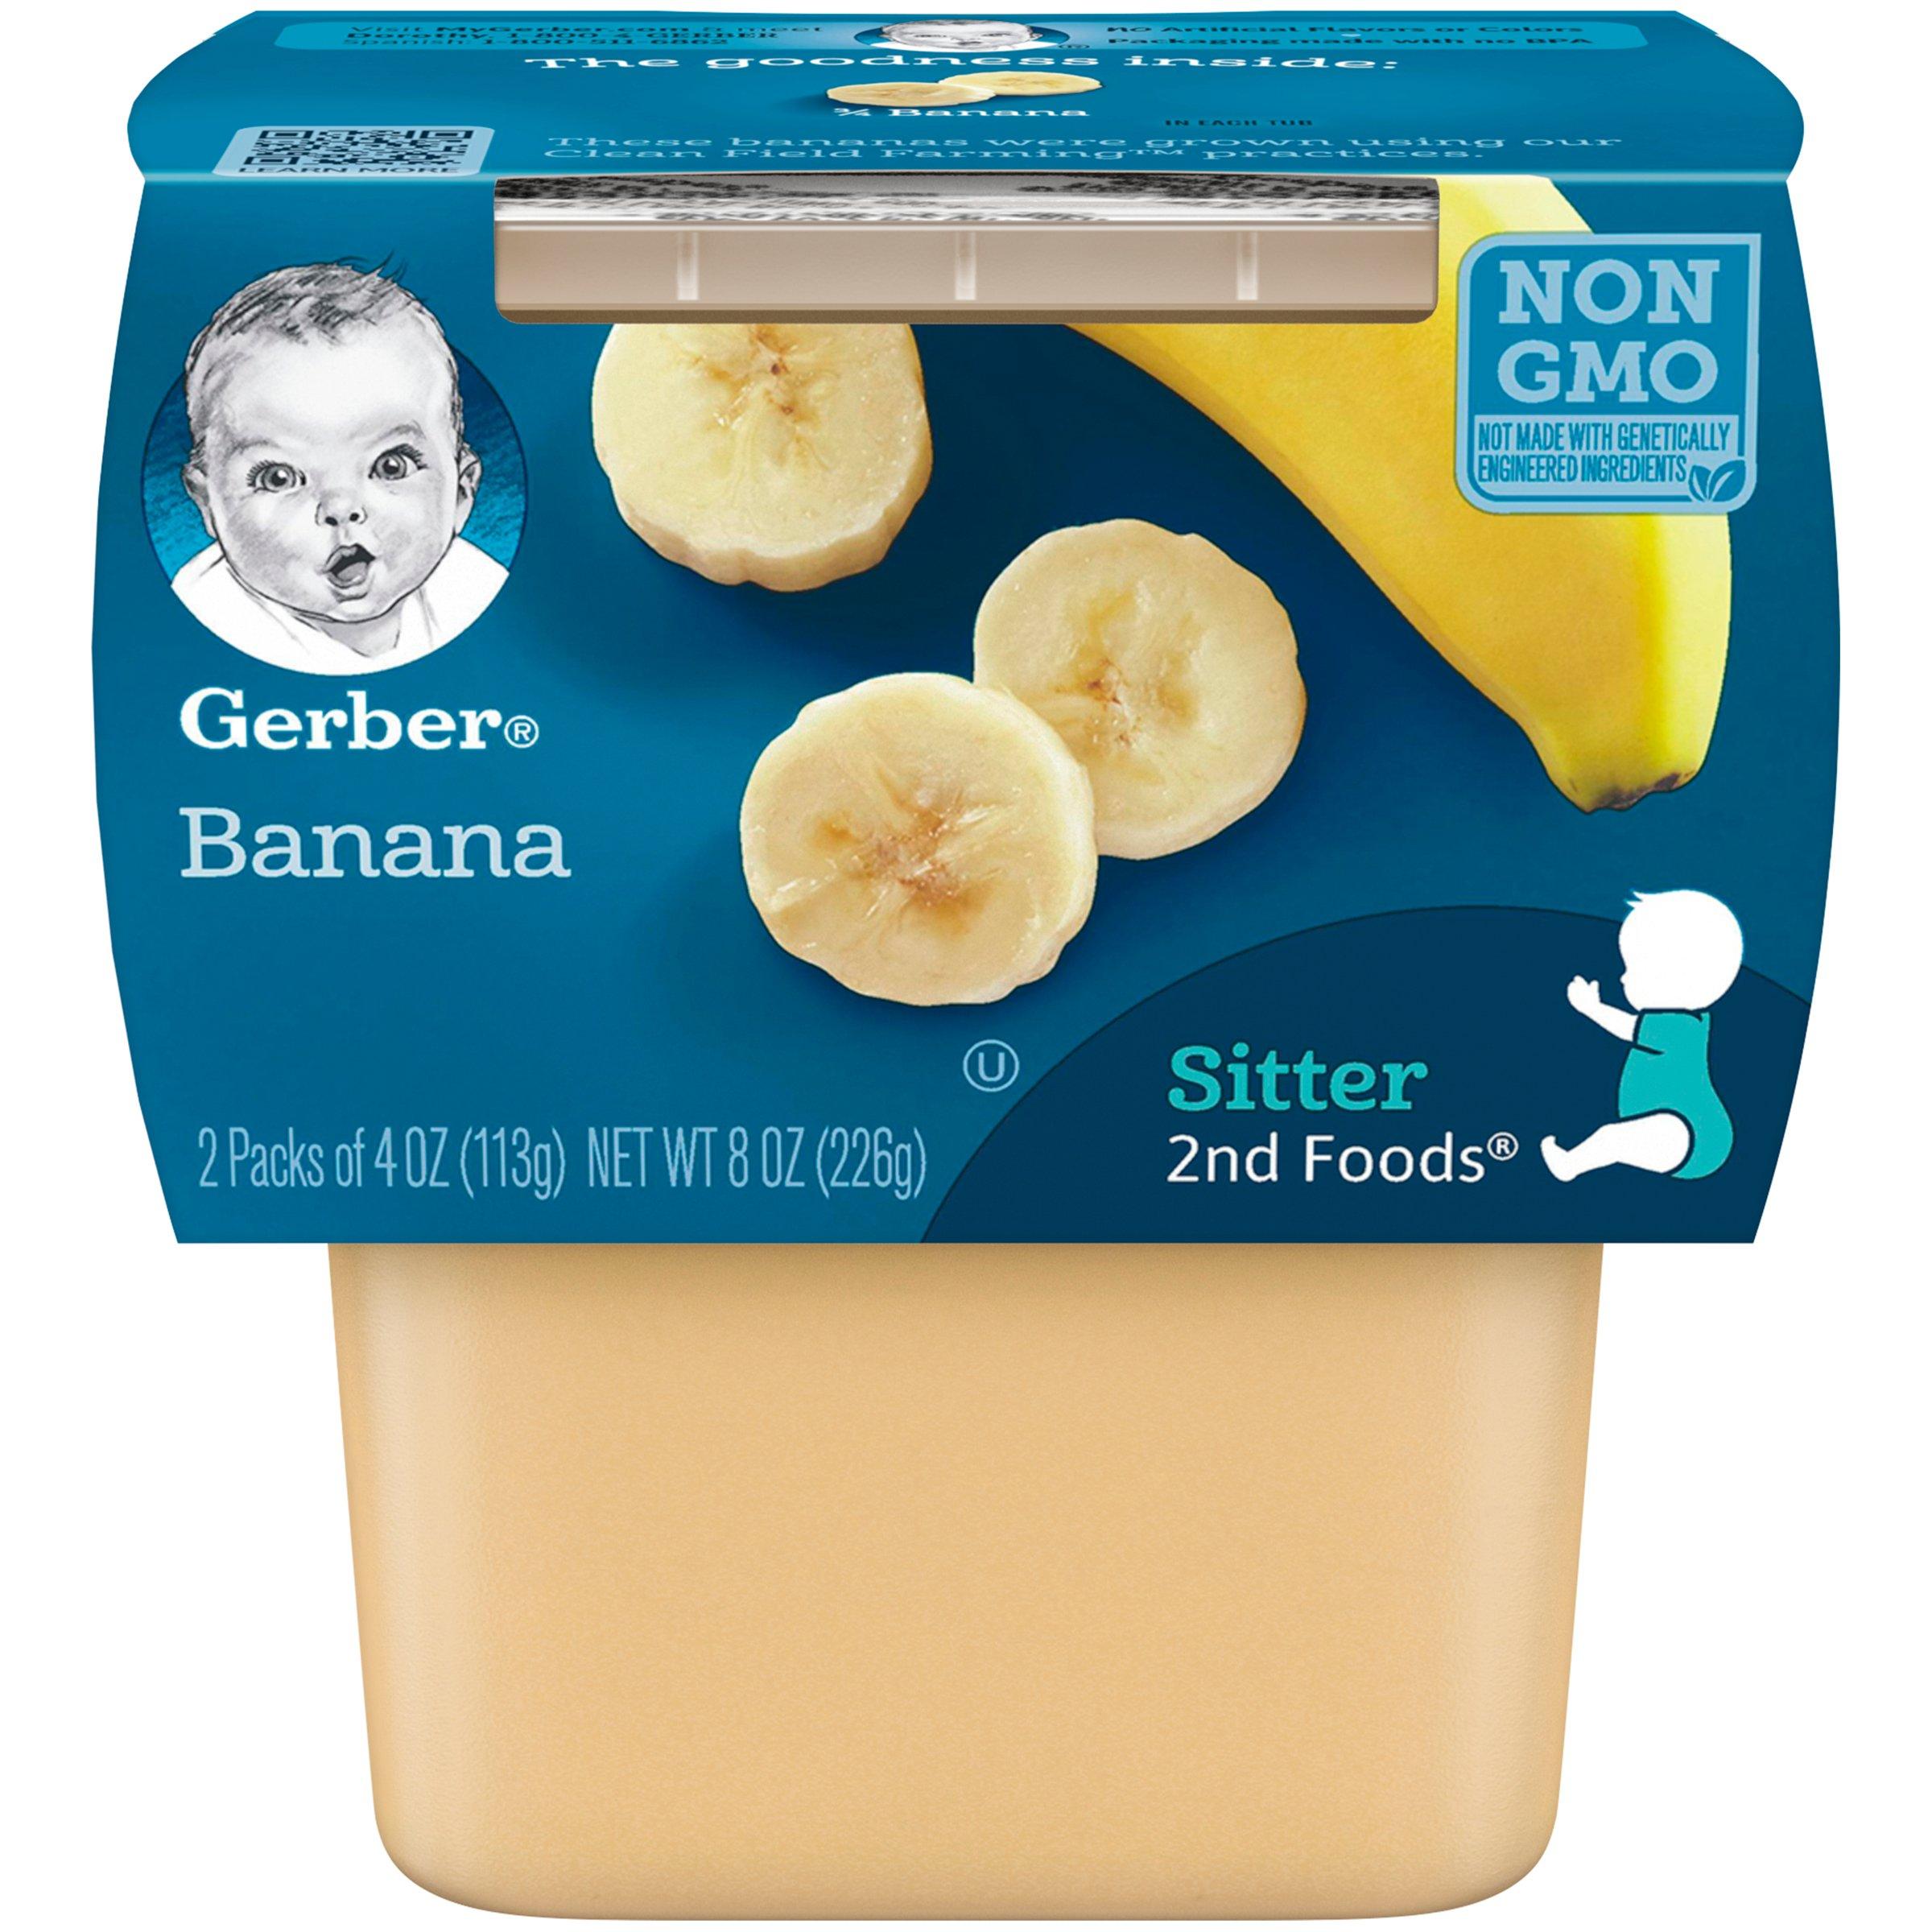 Gerber 2nd Foods Bananas, 4 oz Tubs, 2 Count (Pack of 8)